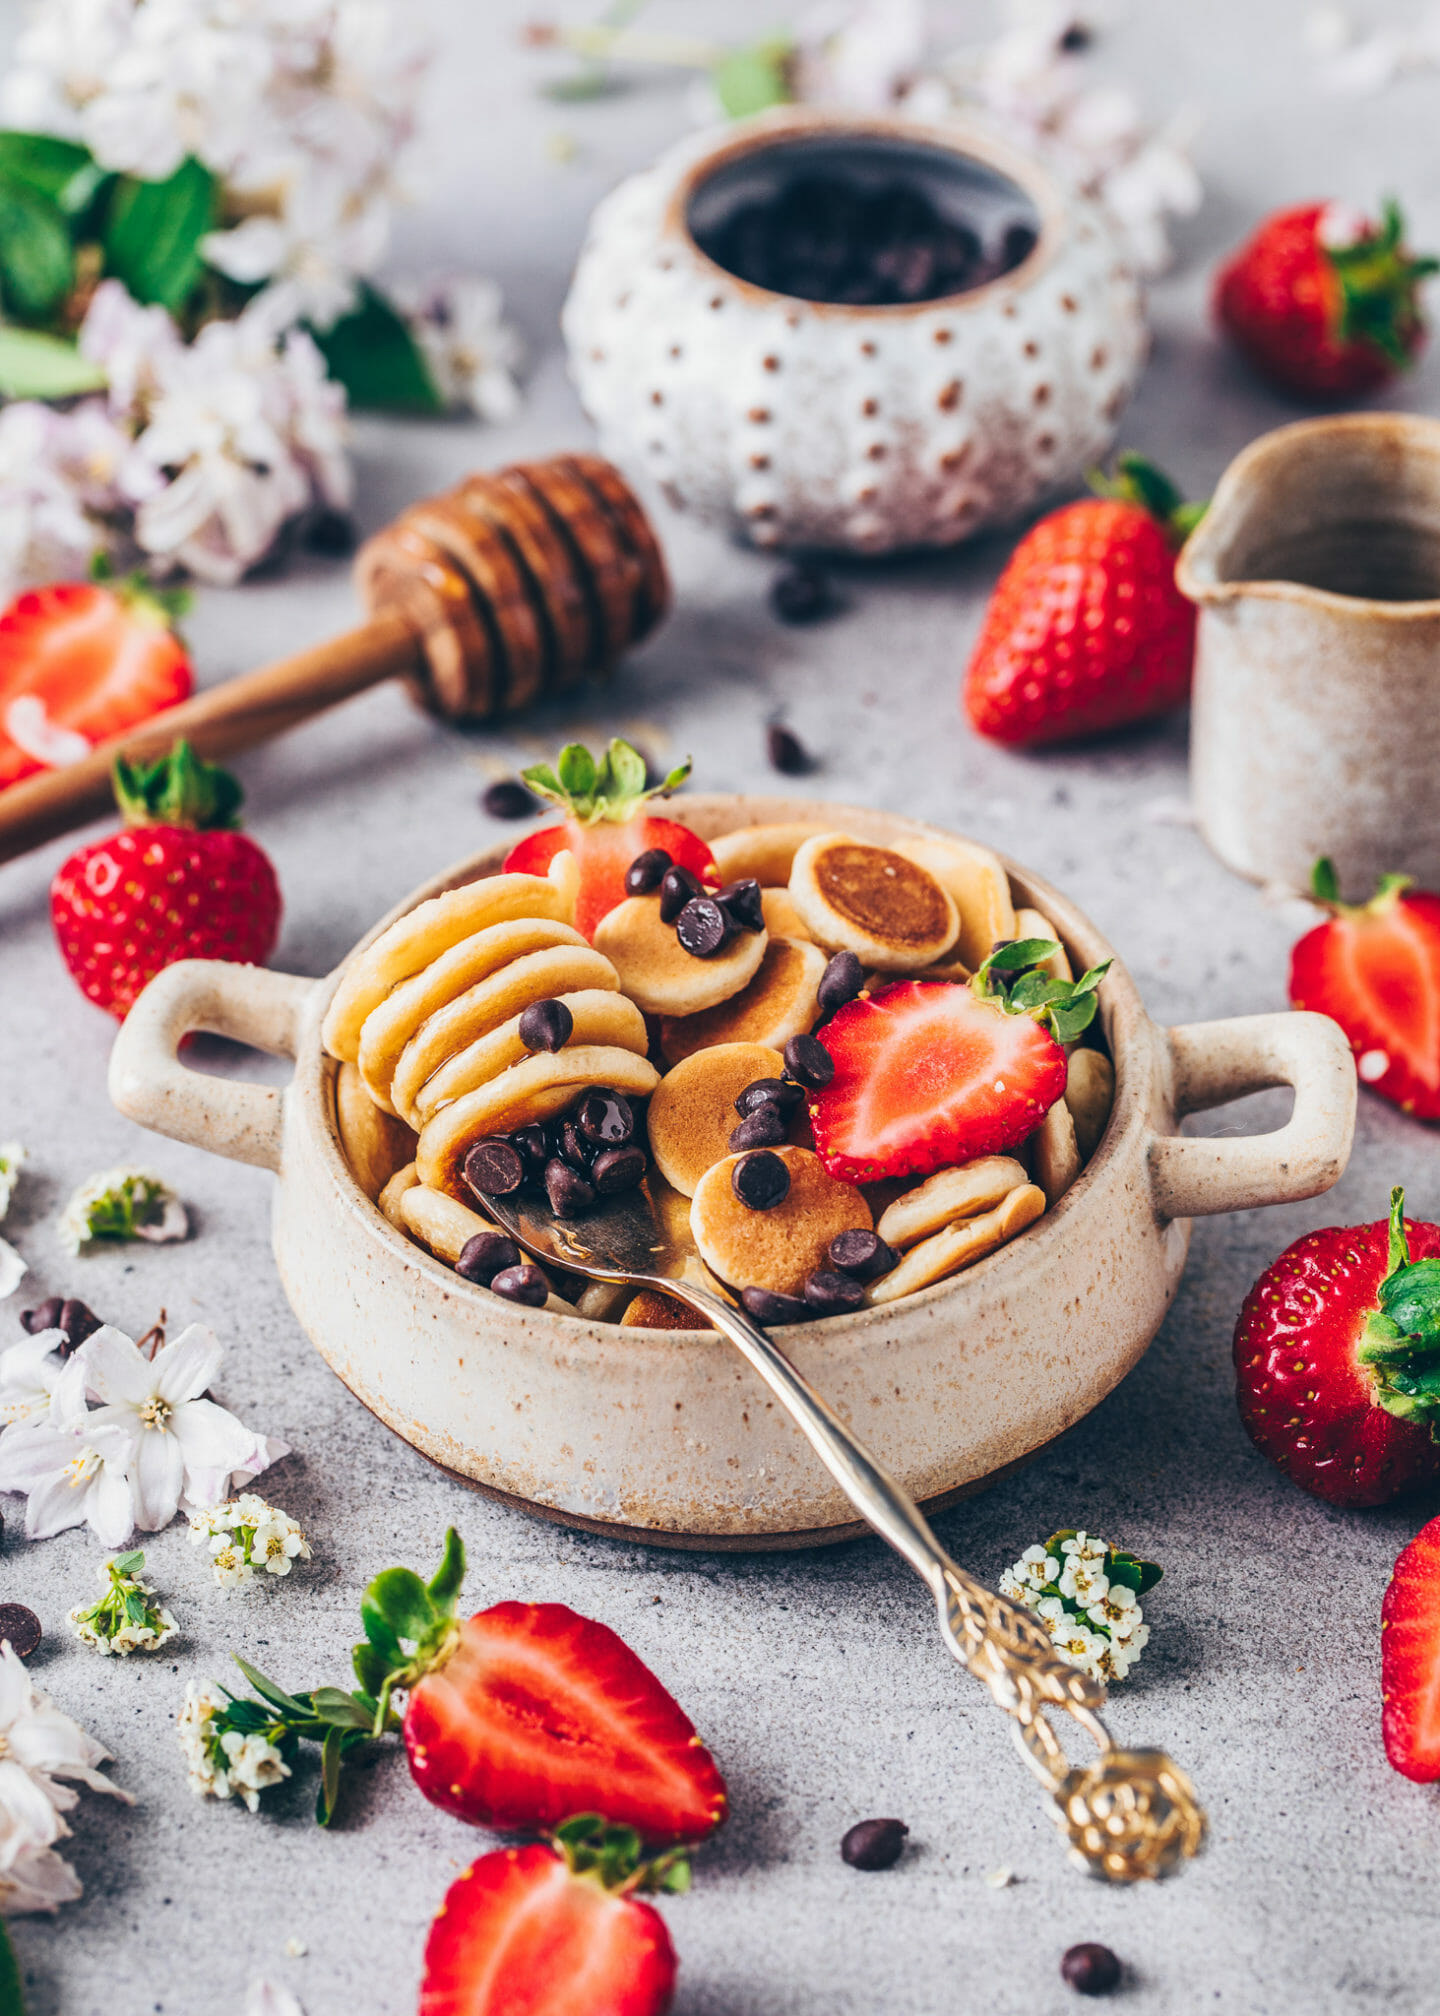 Mini Pfannkuchen (Pancake Cereal)